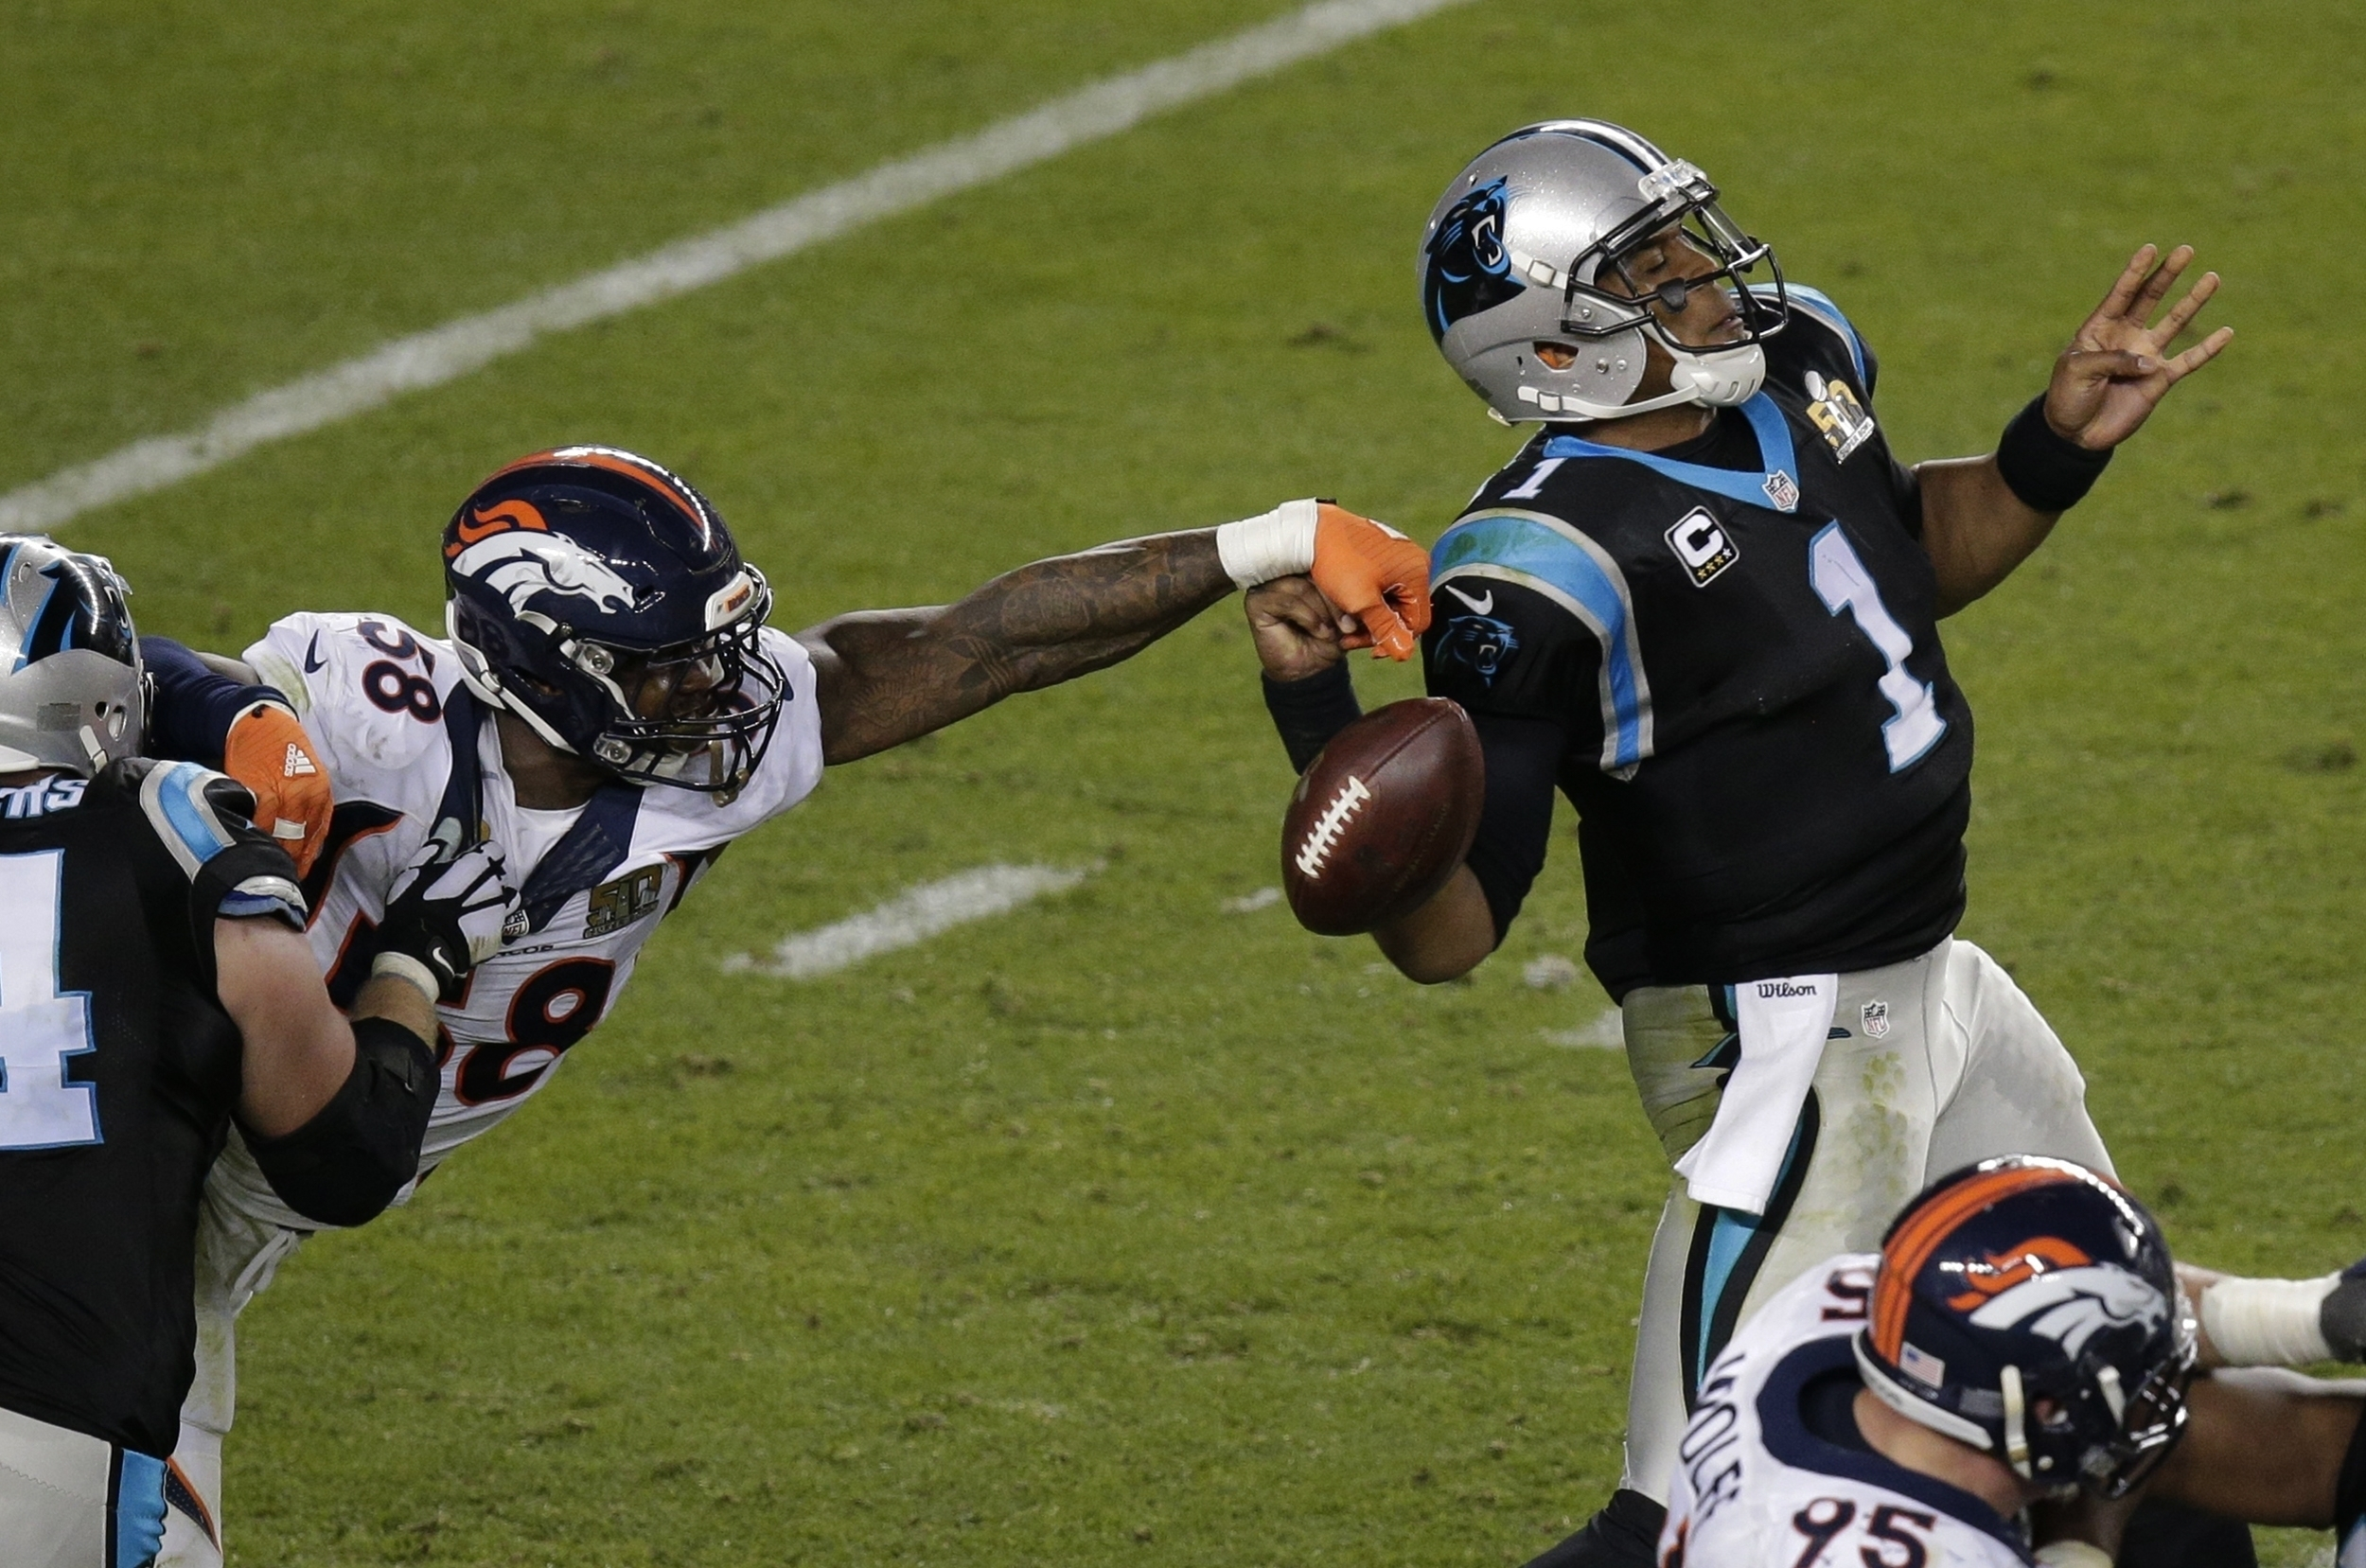 The Loop's Super Bowl Lii Countdown: Best Defensive Players regarding Super Bowl Lii Mvp Voting